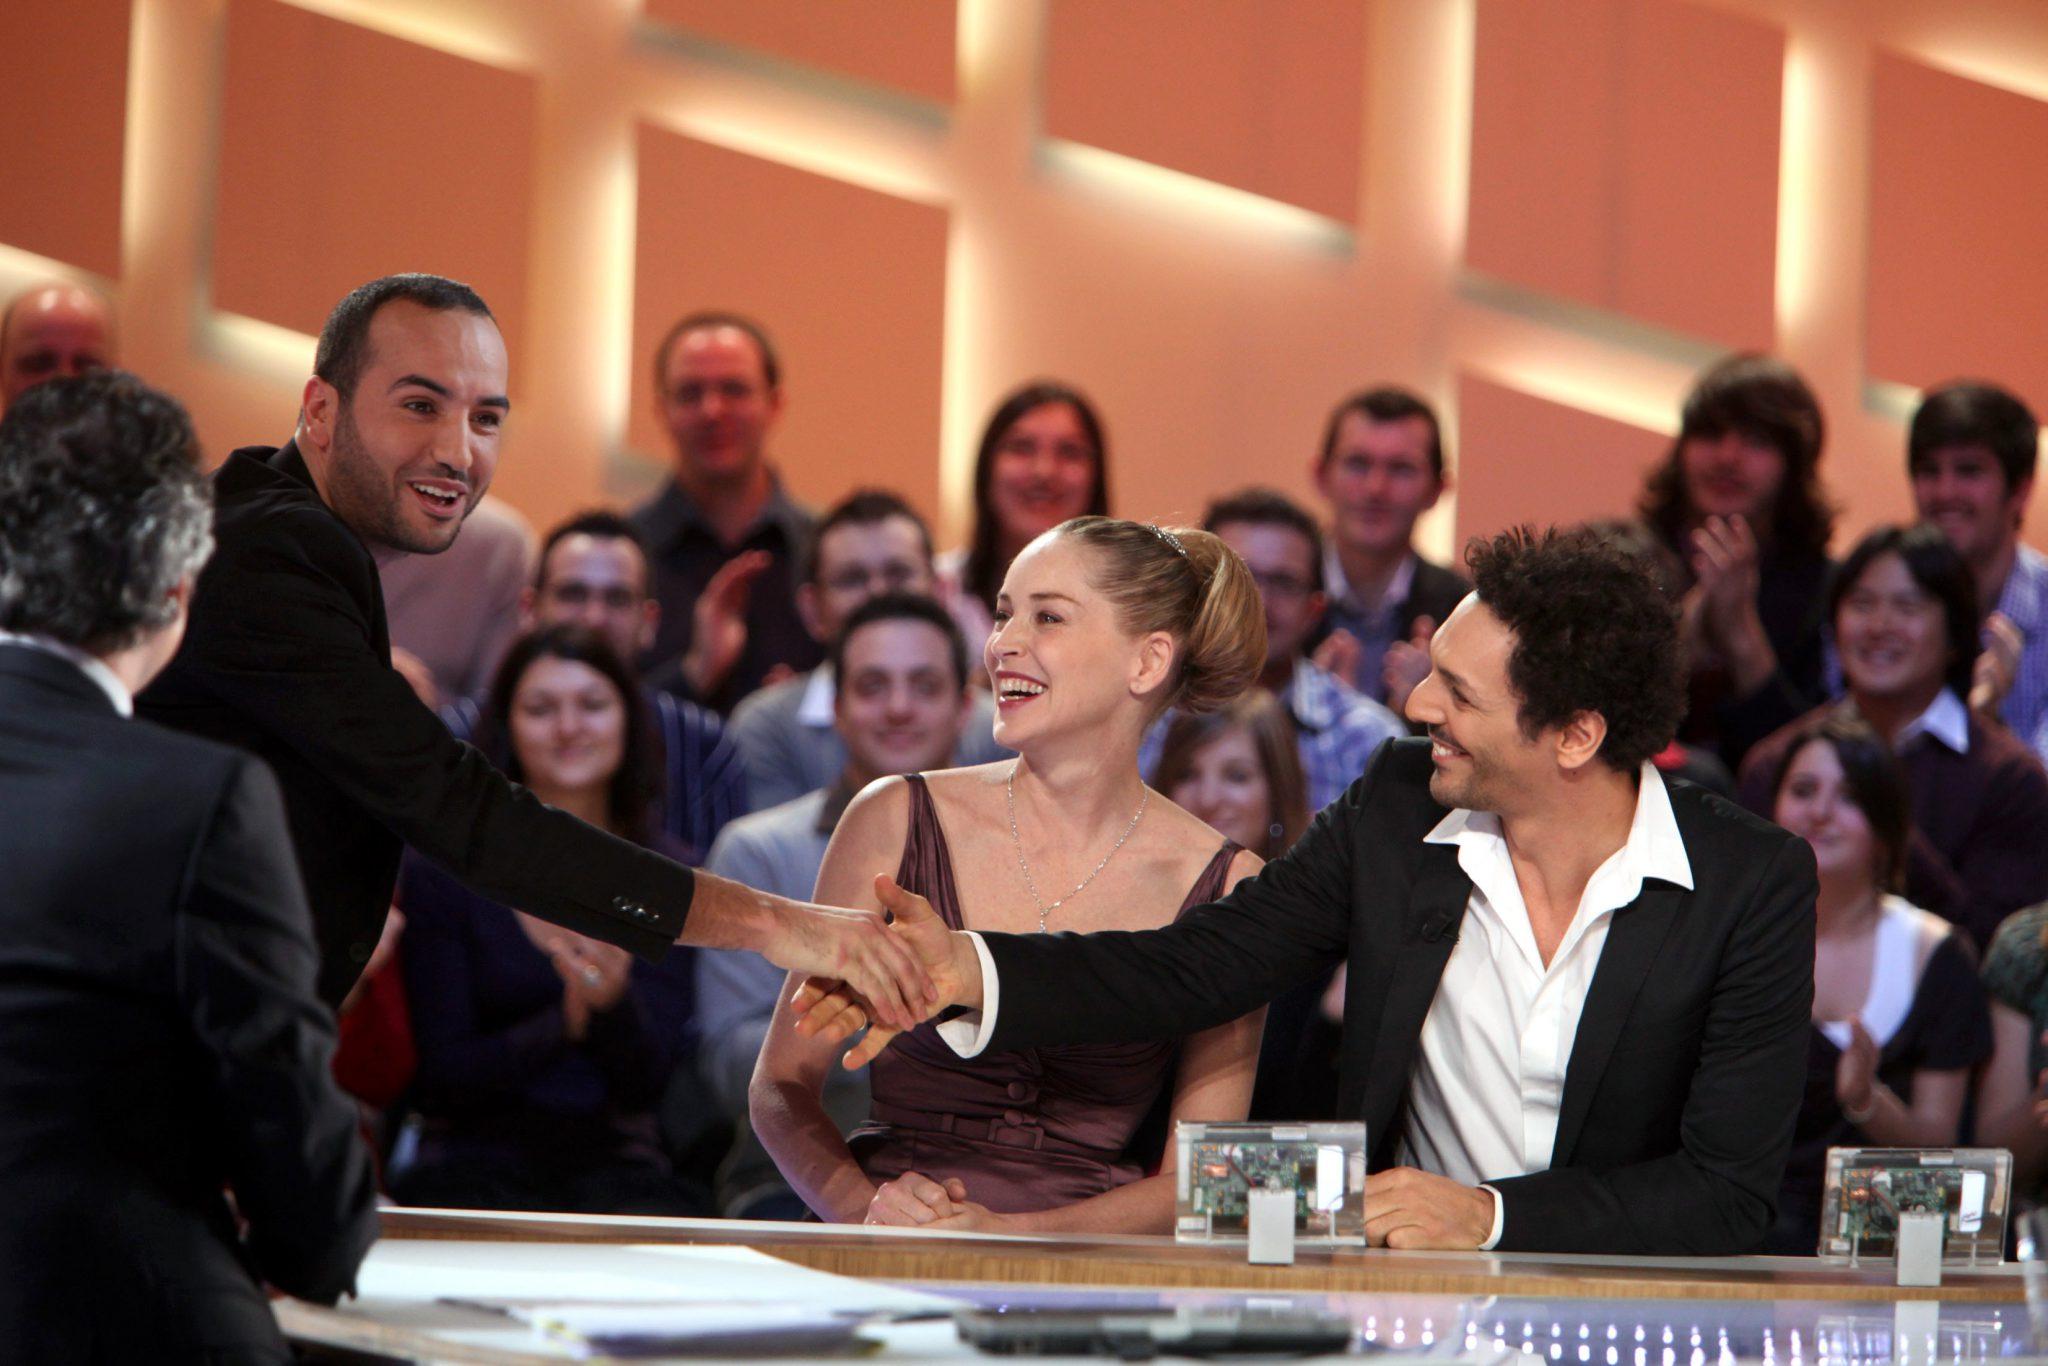 Michel Denisot, Kamel le magicien, Sharon Stone, Tomer Sisley